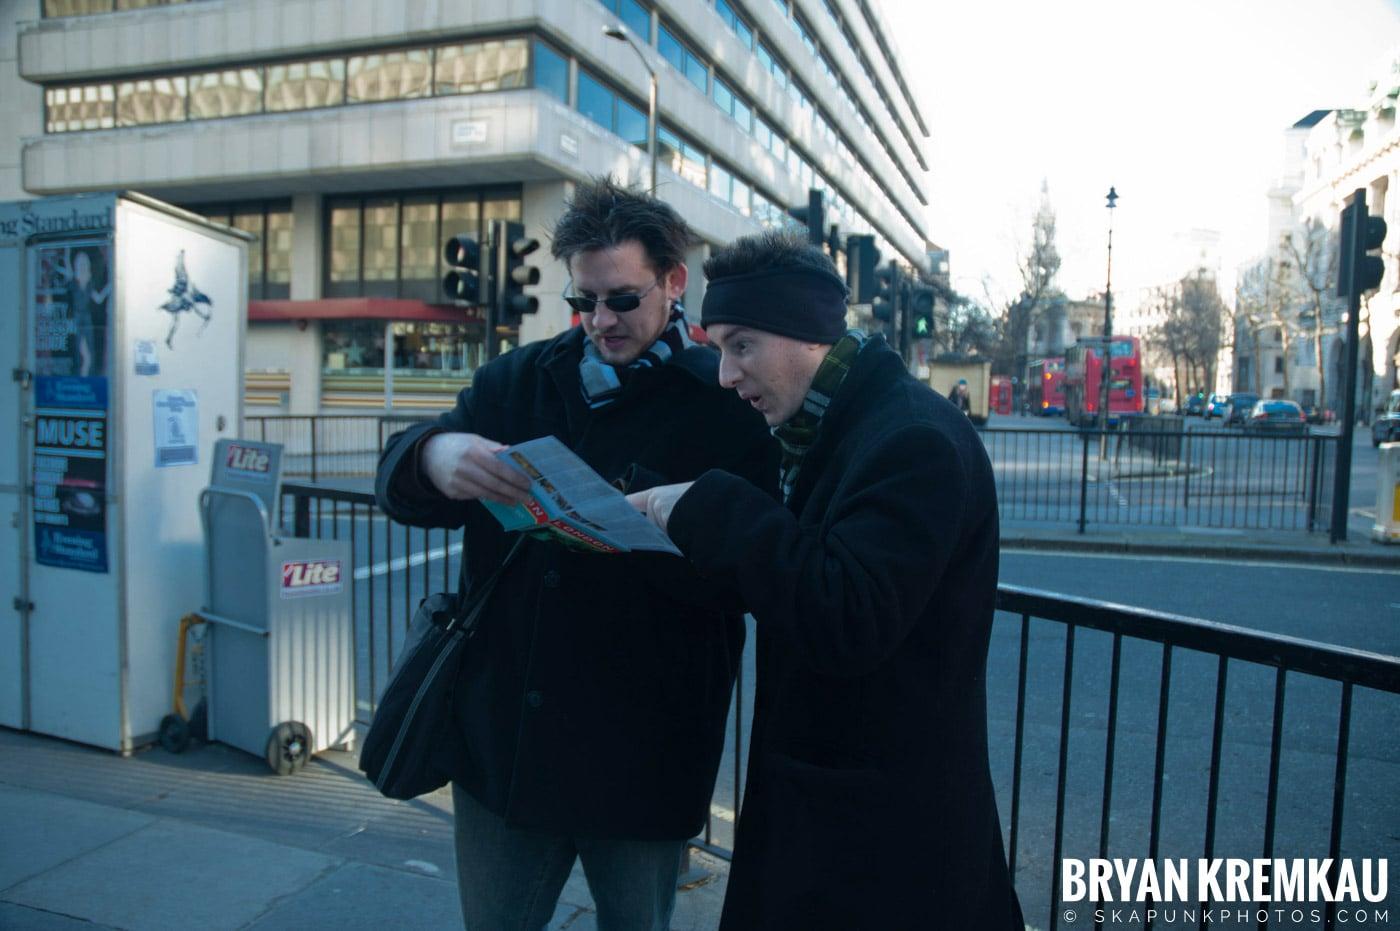 London, England - Day 2 - 12.9.06 (20)